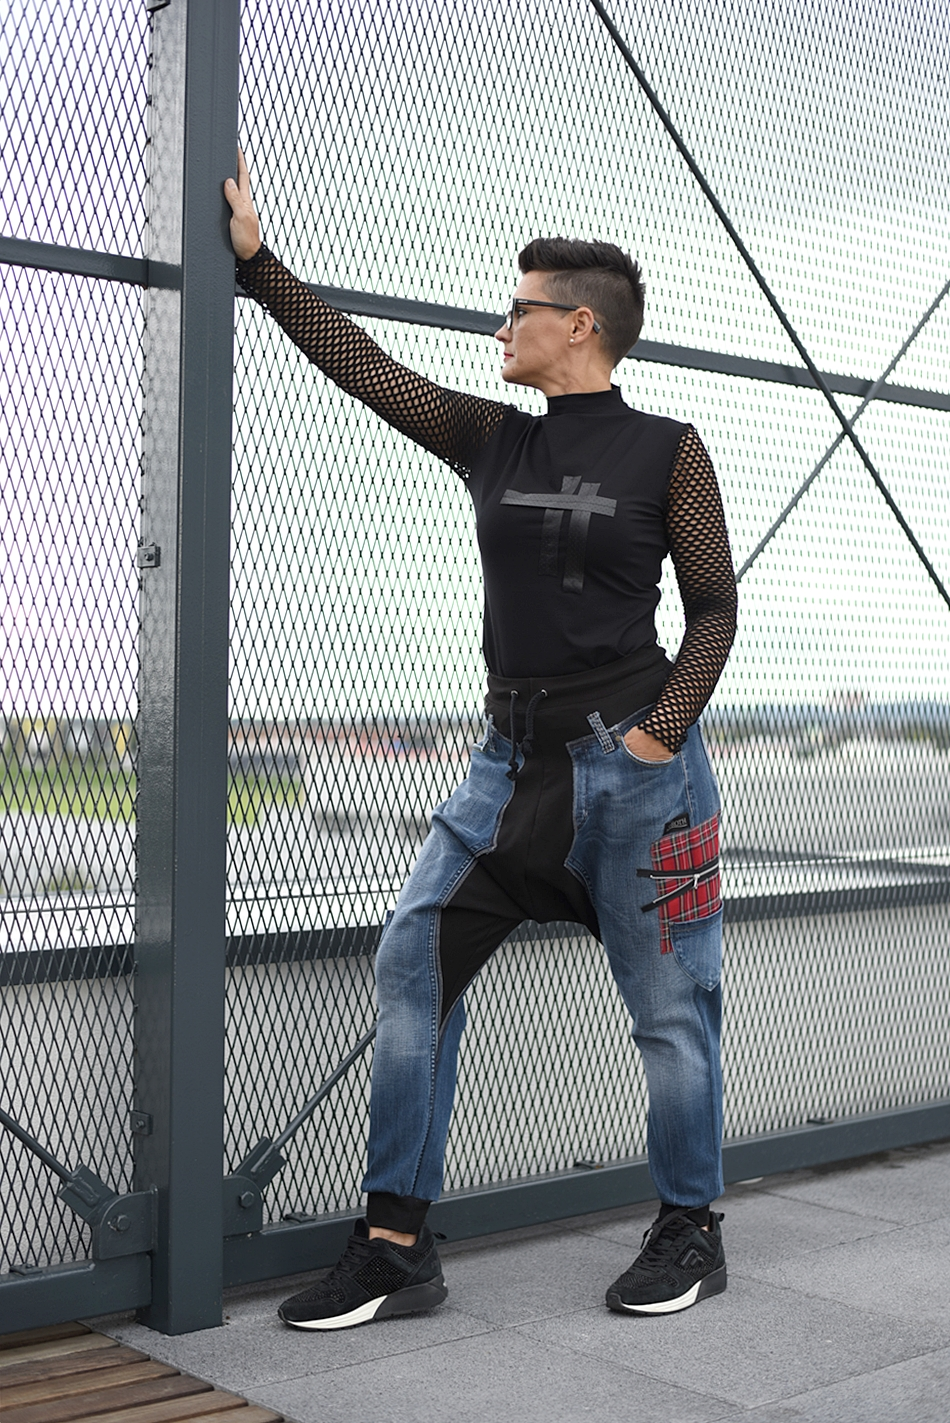 Broth_design_clothes_0100